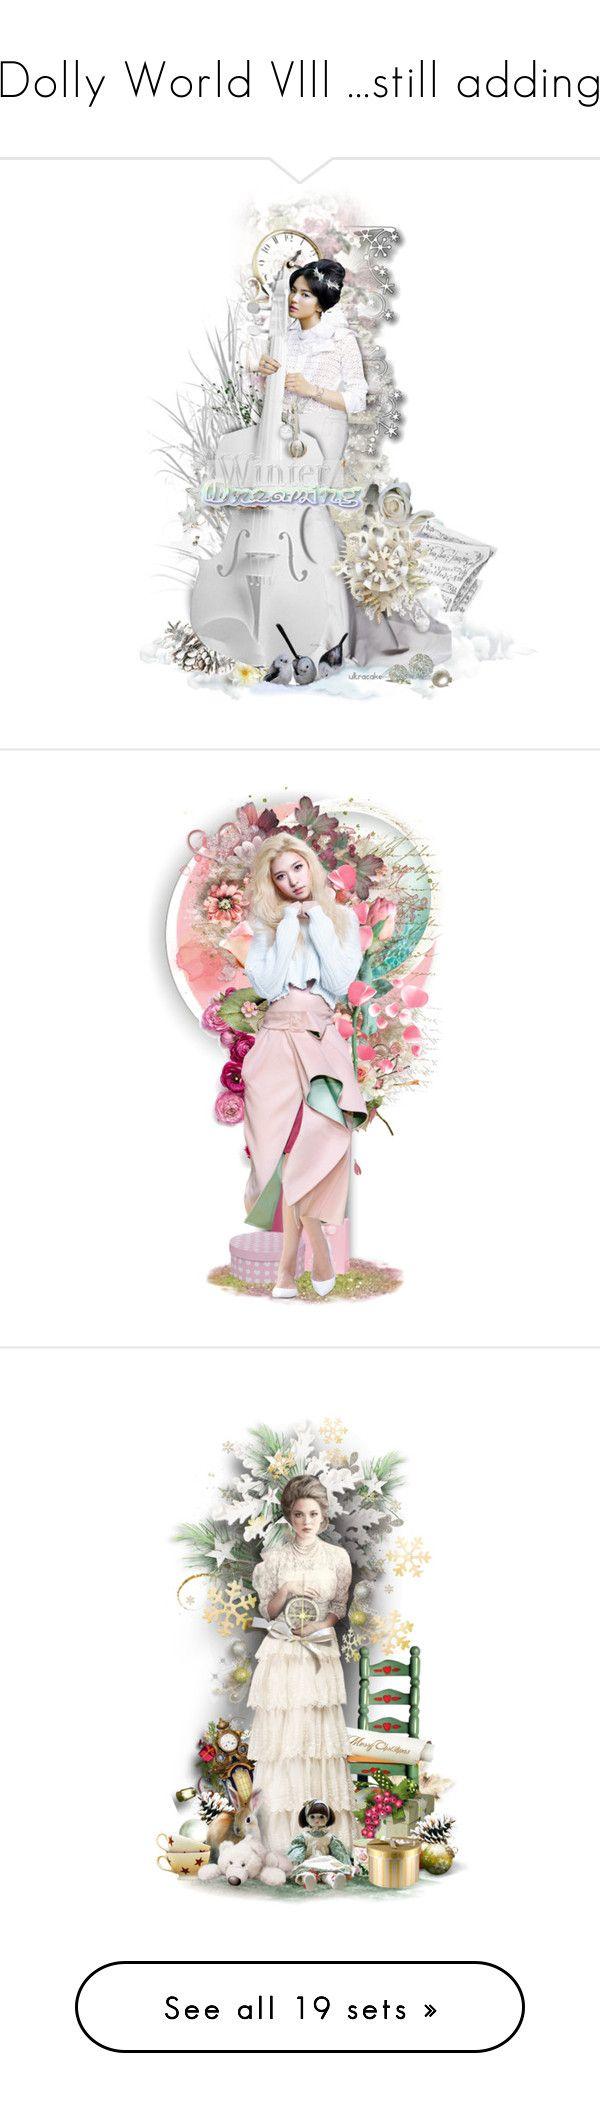 """Dolly World Vlll ...still adding"" by lovetodrinktea ❤ liked on Polyvore featuring art, Winter, Christmas, white, dolls, ultracake, satinee, bhldn, OriginalCharactersSeasonOne and BotOCs1"